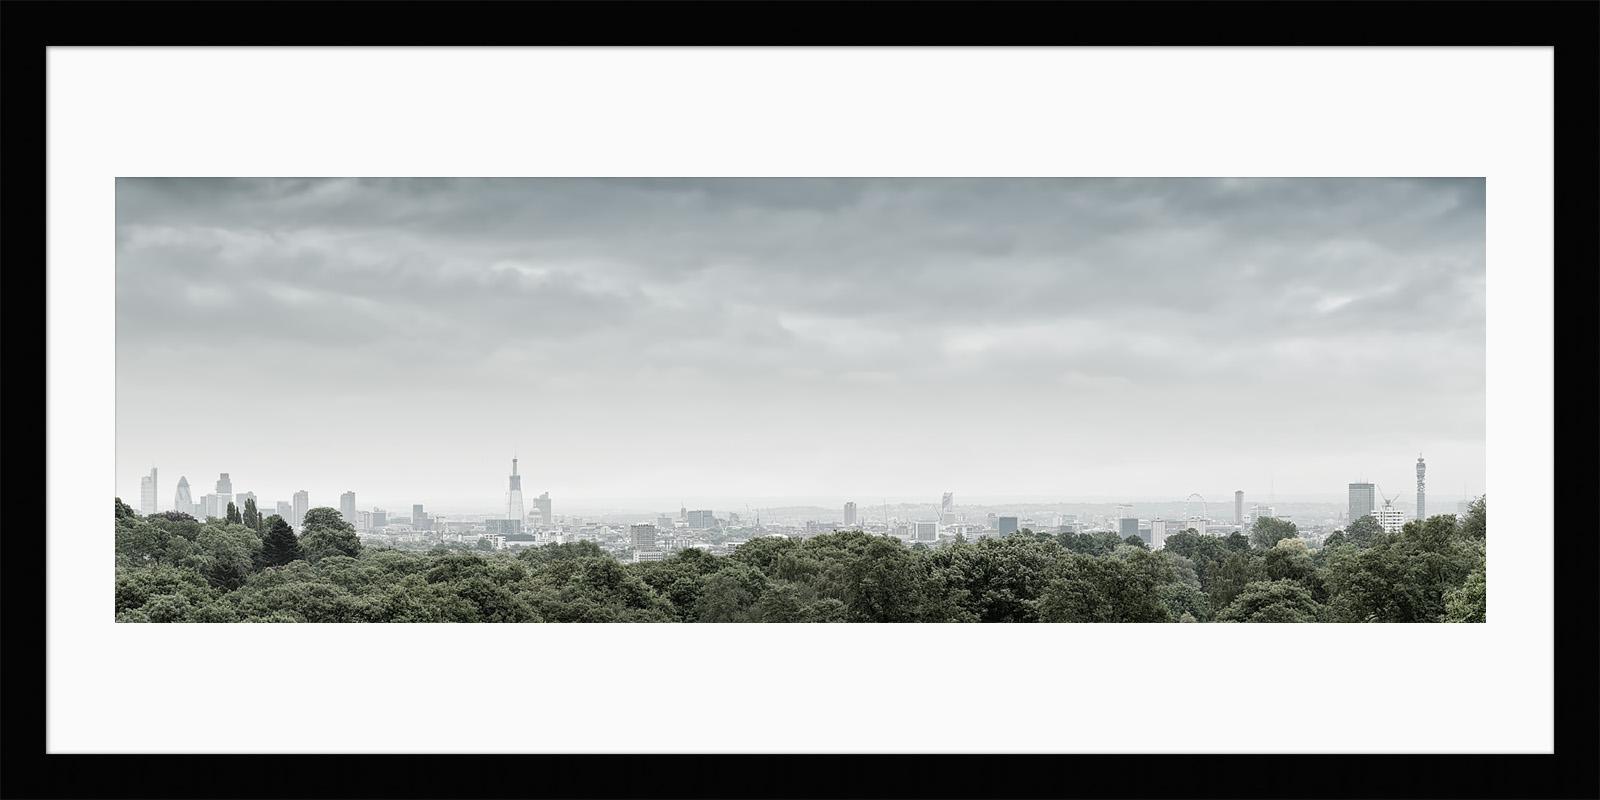 Hampstead Heath View 2010 - Framed Photo Print of London